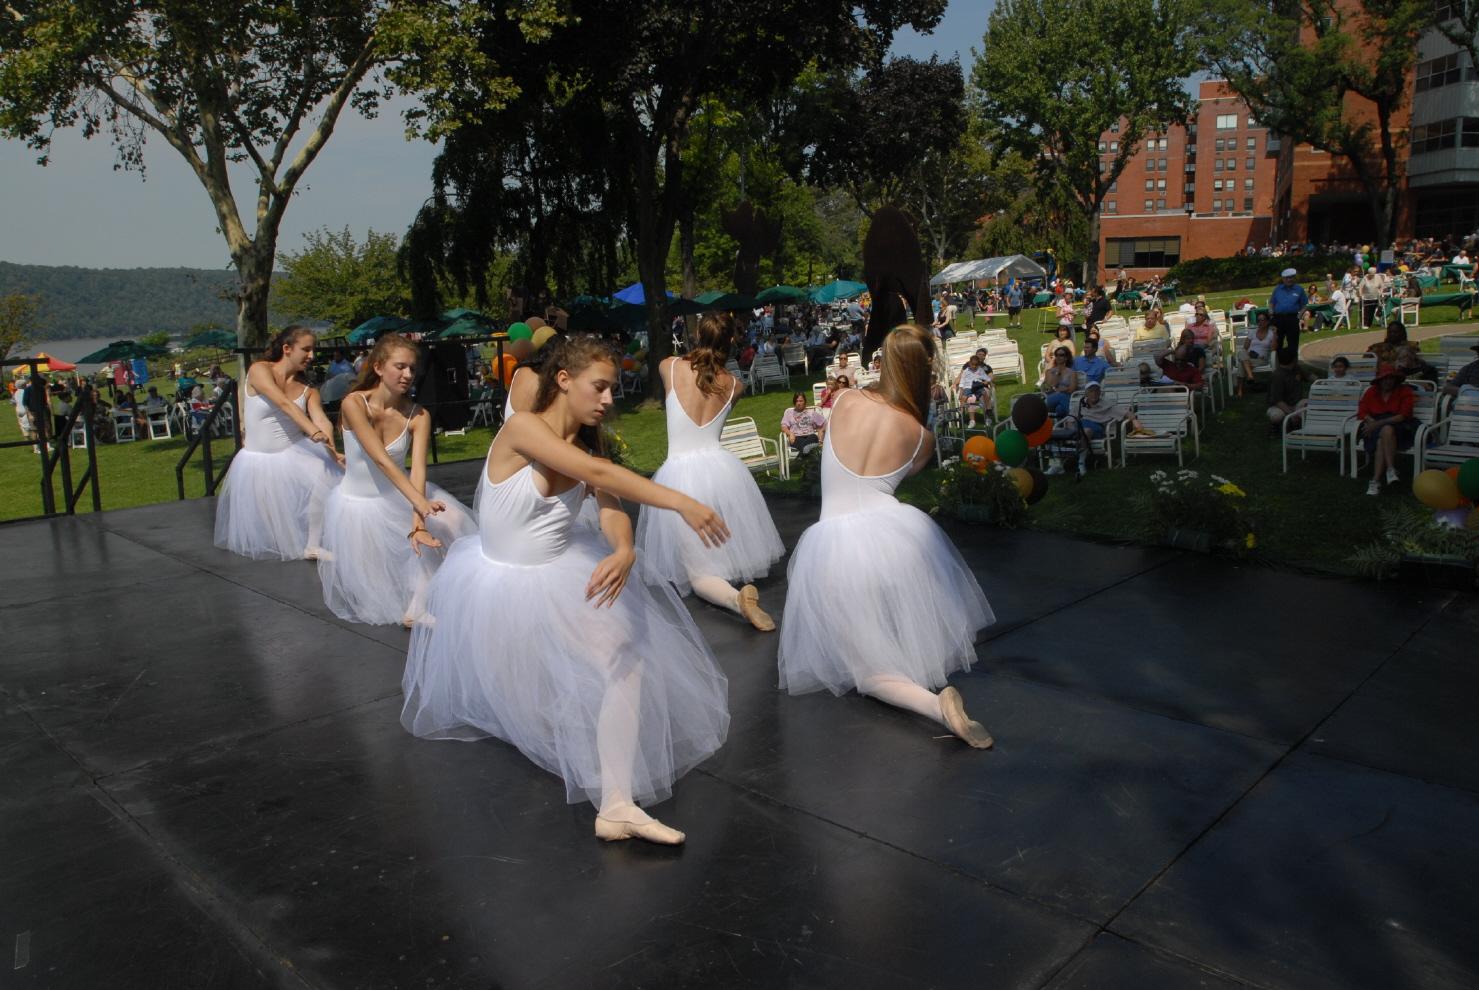 ballet_elite_at_riverdale_9.jpg